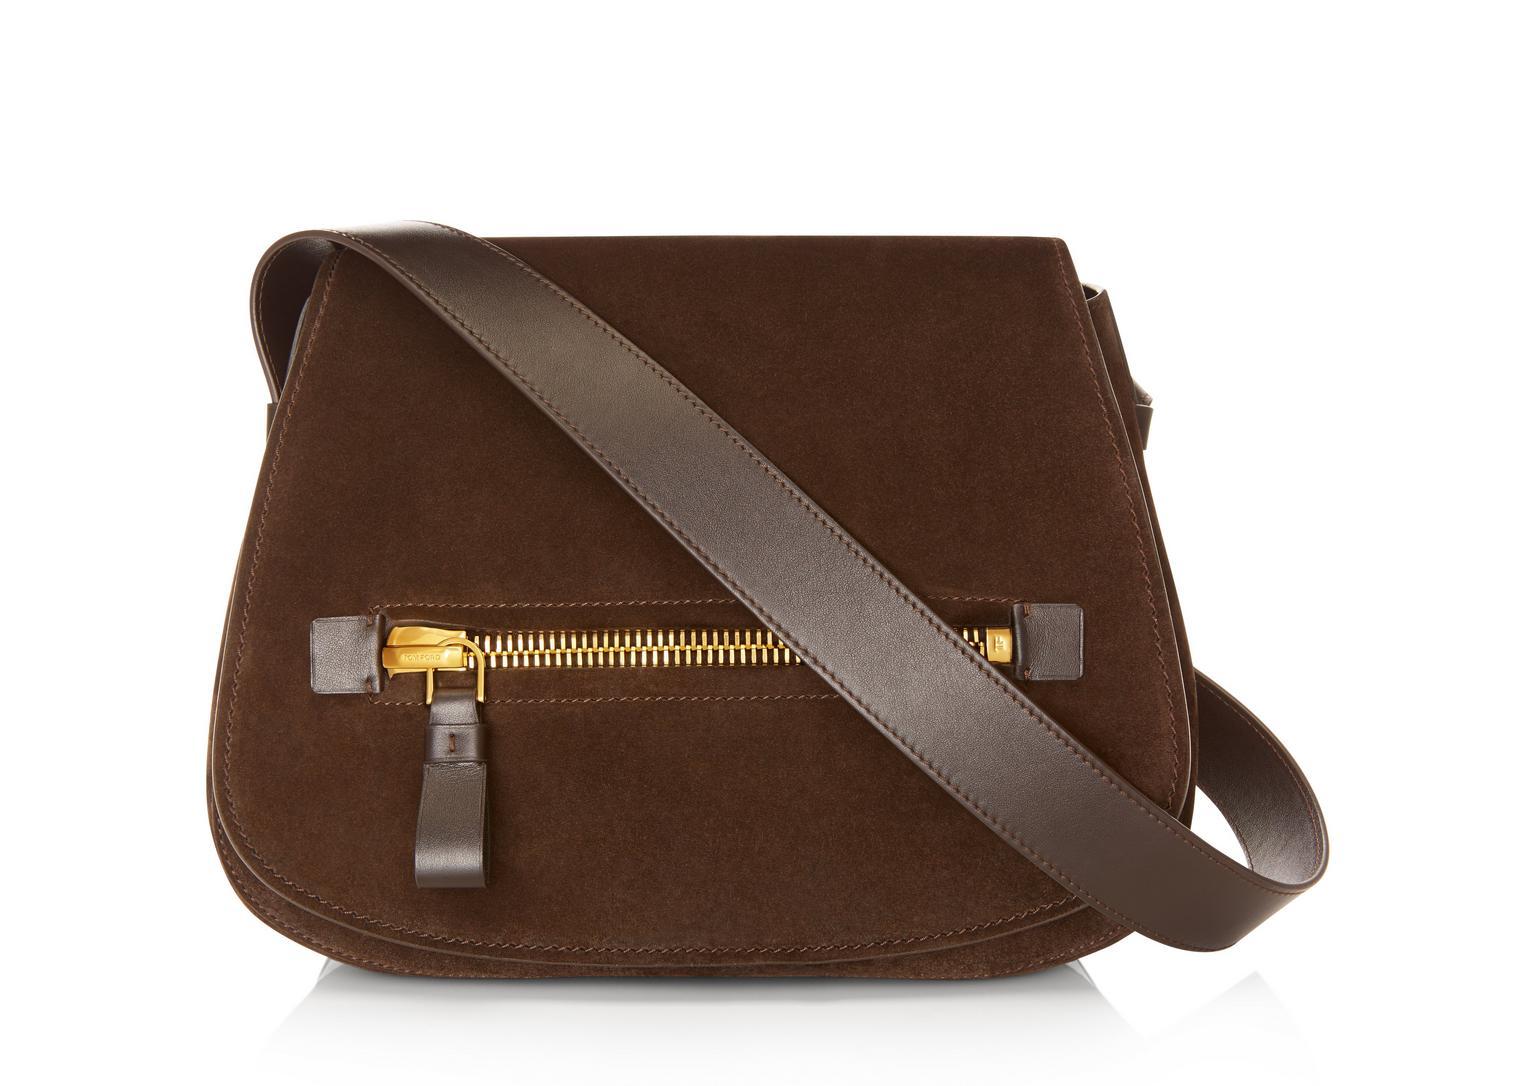 Tom Ford Jennifer Medium Suede Saddle Bag, Dark Brown